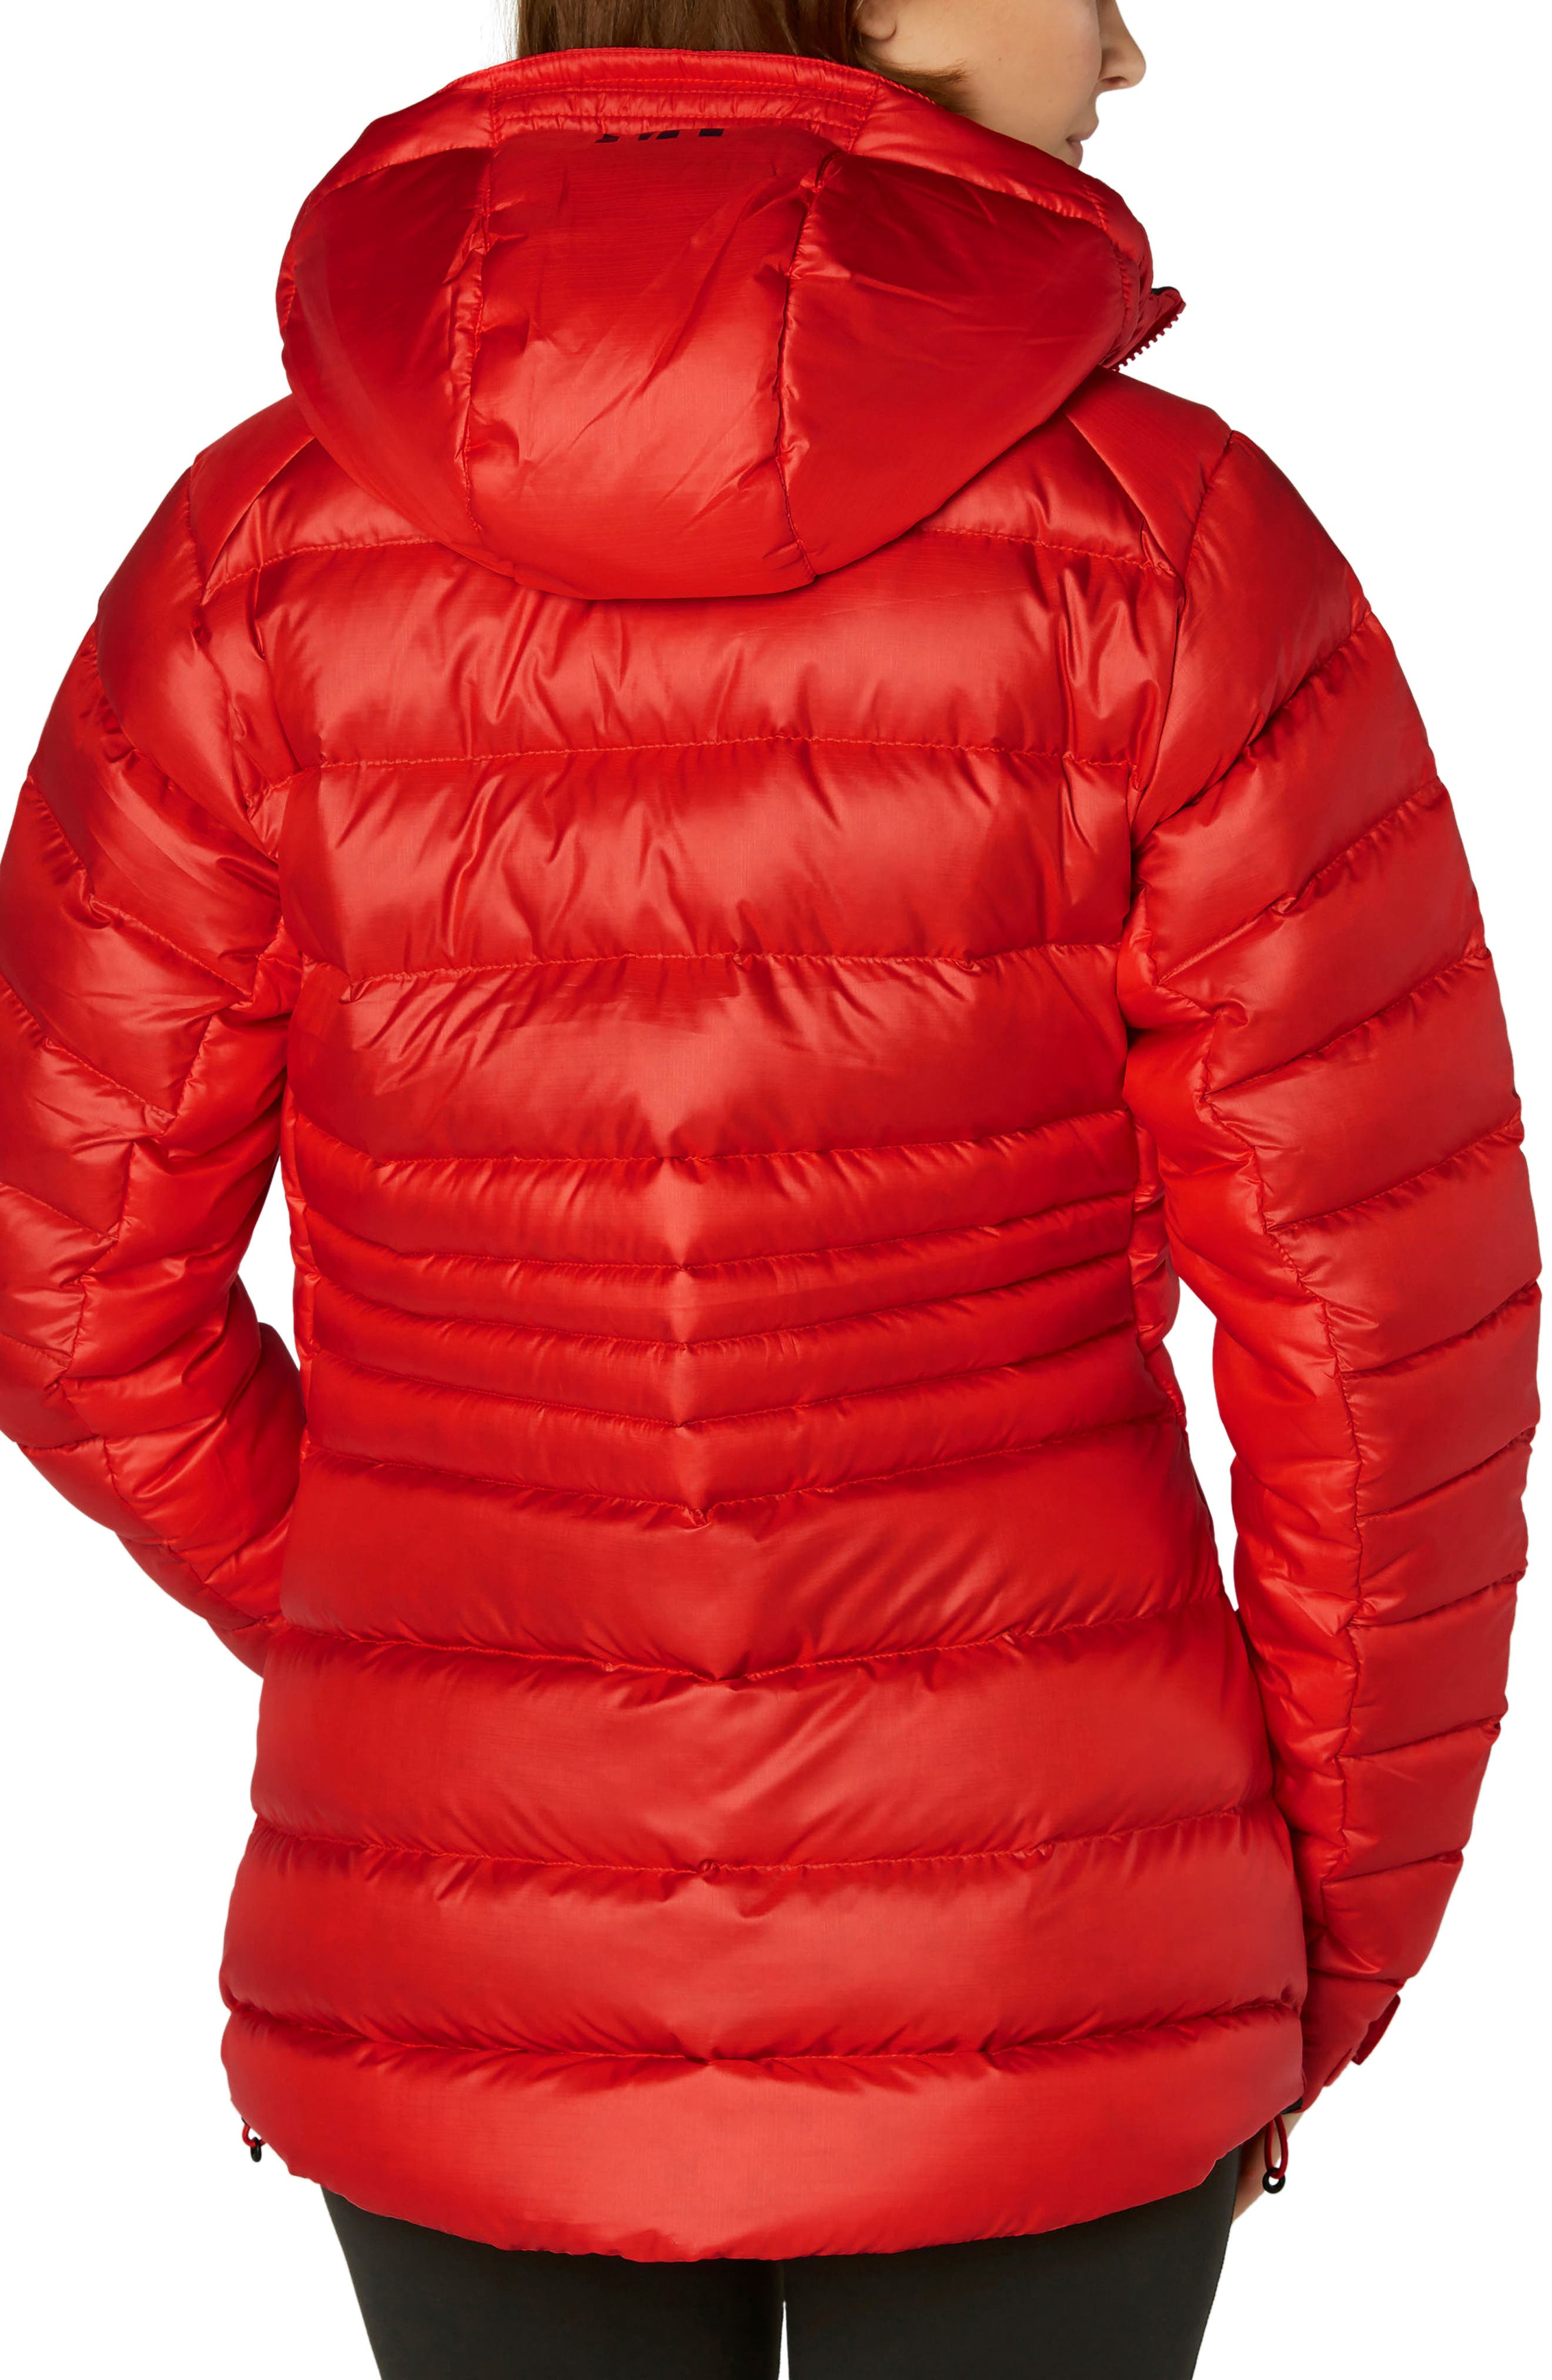 Vanir Icefall Down Jacket,                             Alternate thumbnail 2, color,                             106 Melt Down